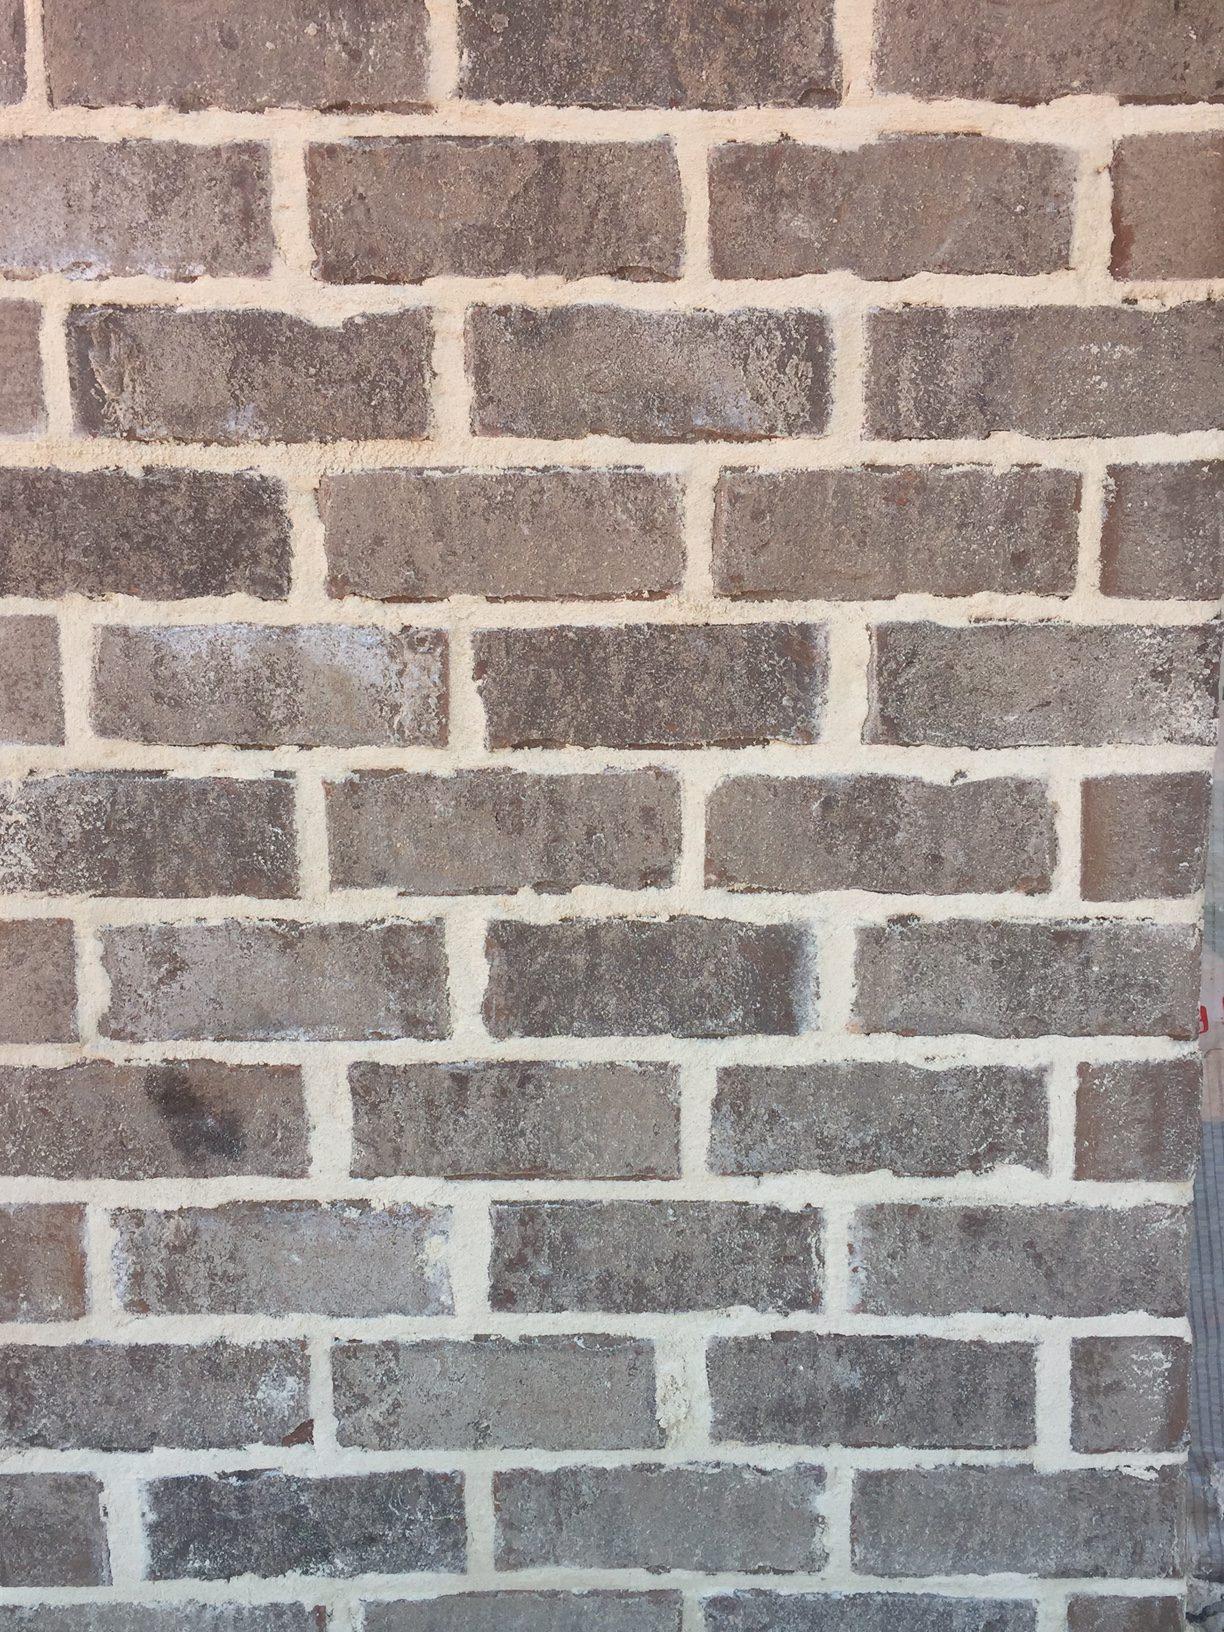 Chimney Rock South Alabama Brick Company